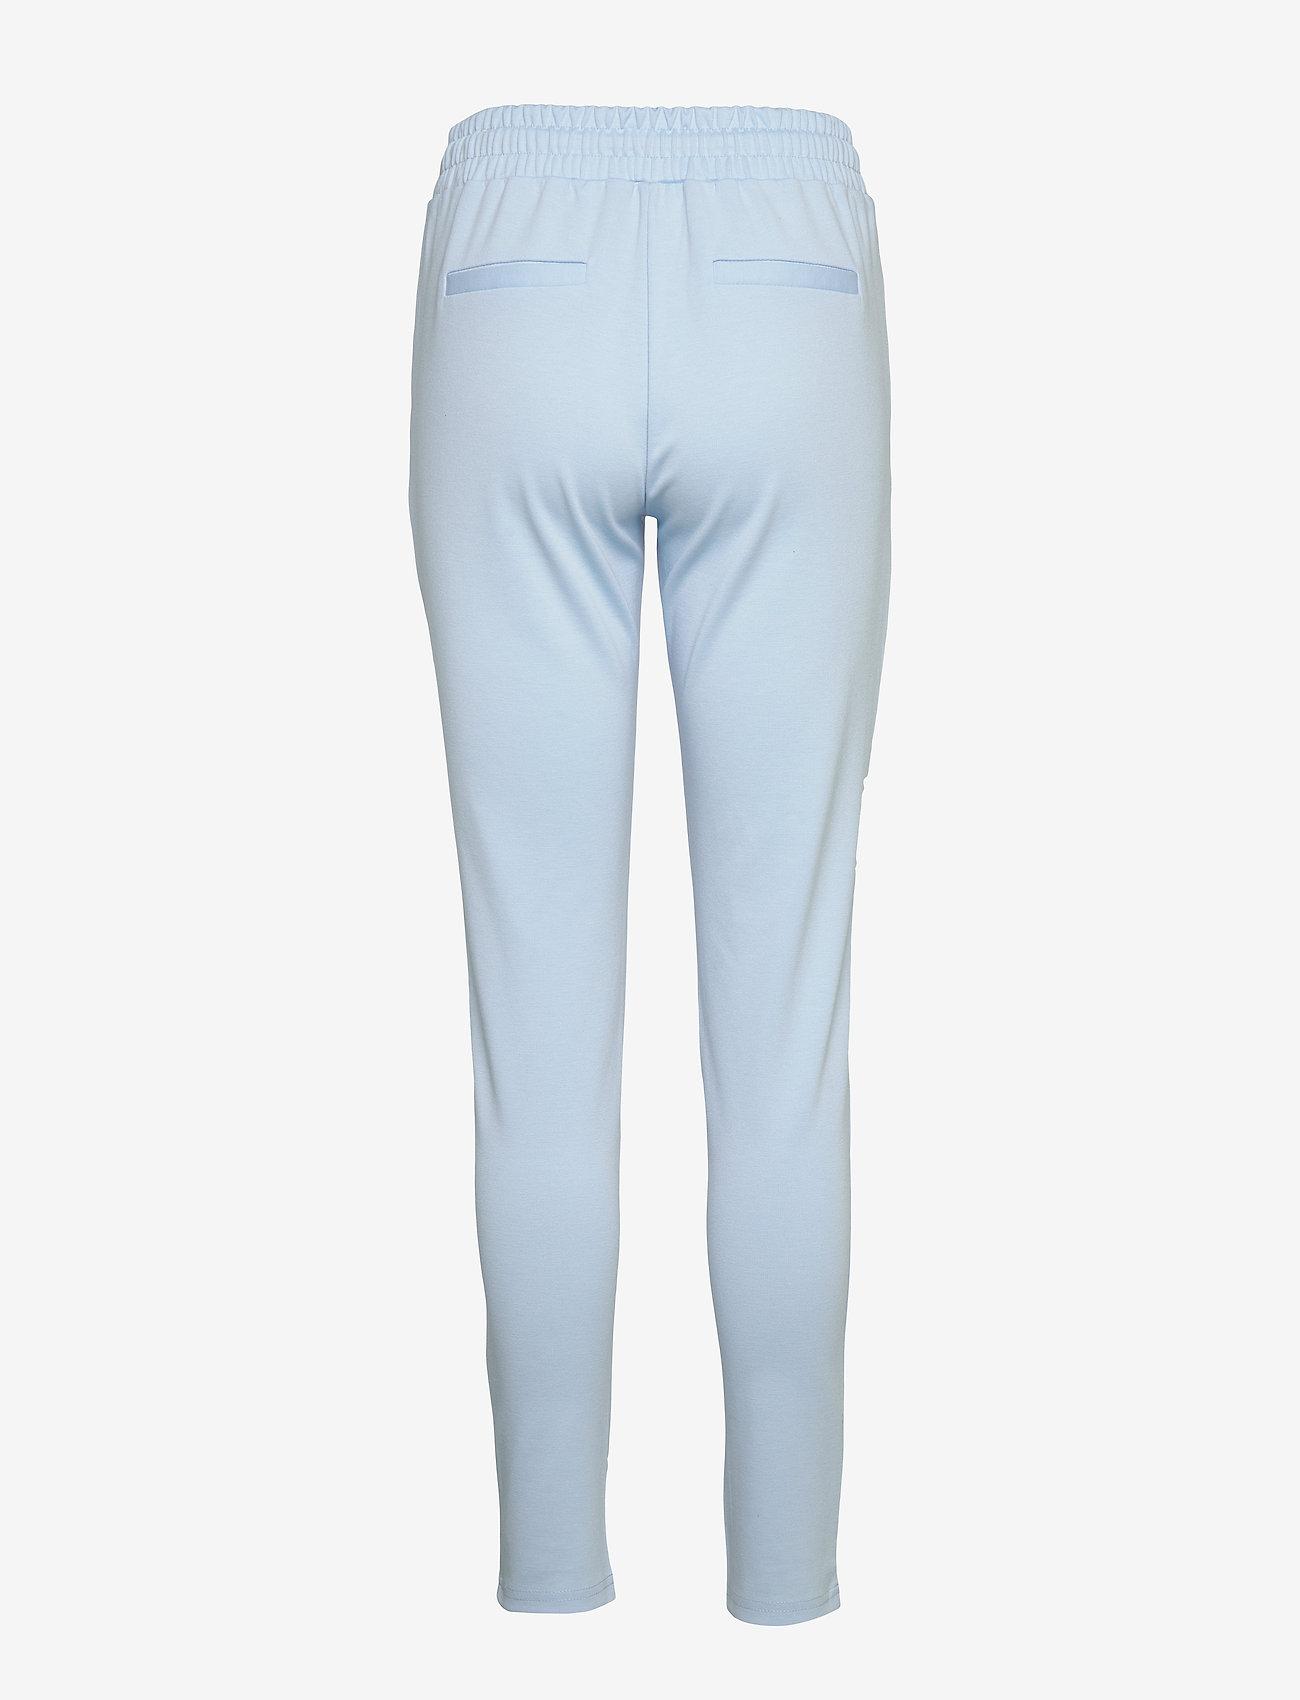 ICHI IHKATE PA2 - Bukser COOL BLUE - Dameklær Spesialtilbud